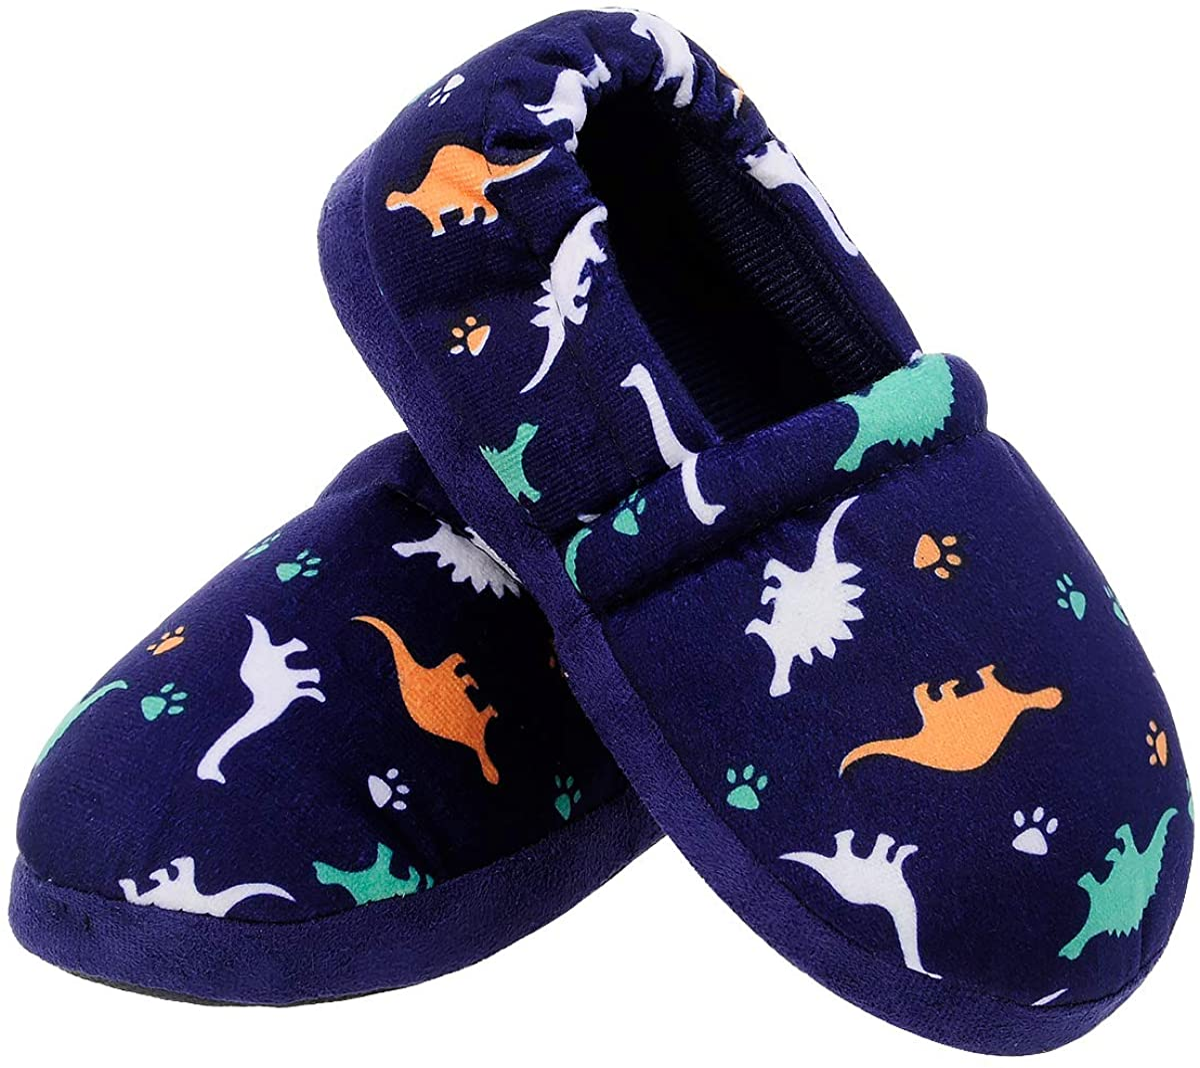 MIXIN Little Kids Boys Indoor House Slip-on Slippers Soft Warm Memory Foam